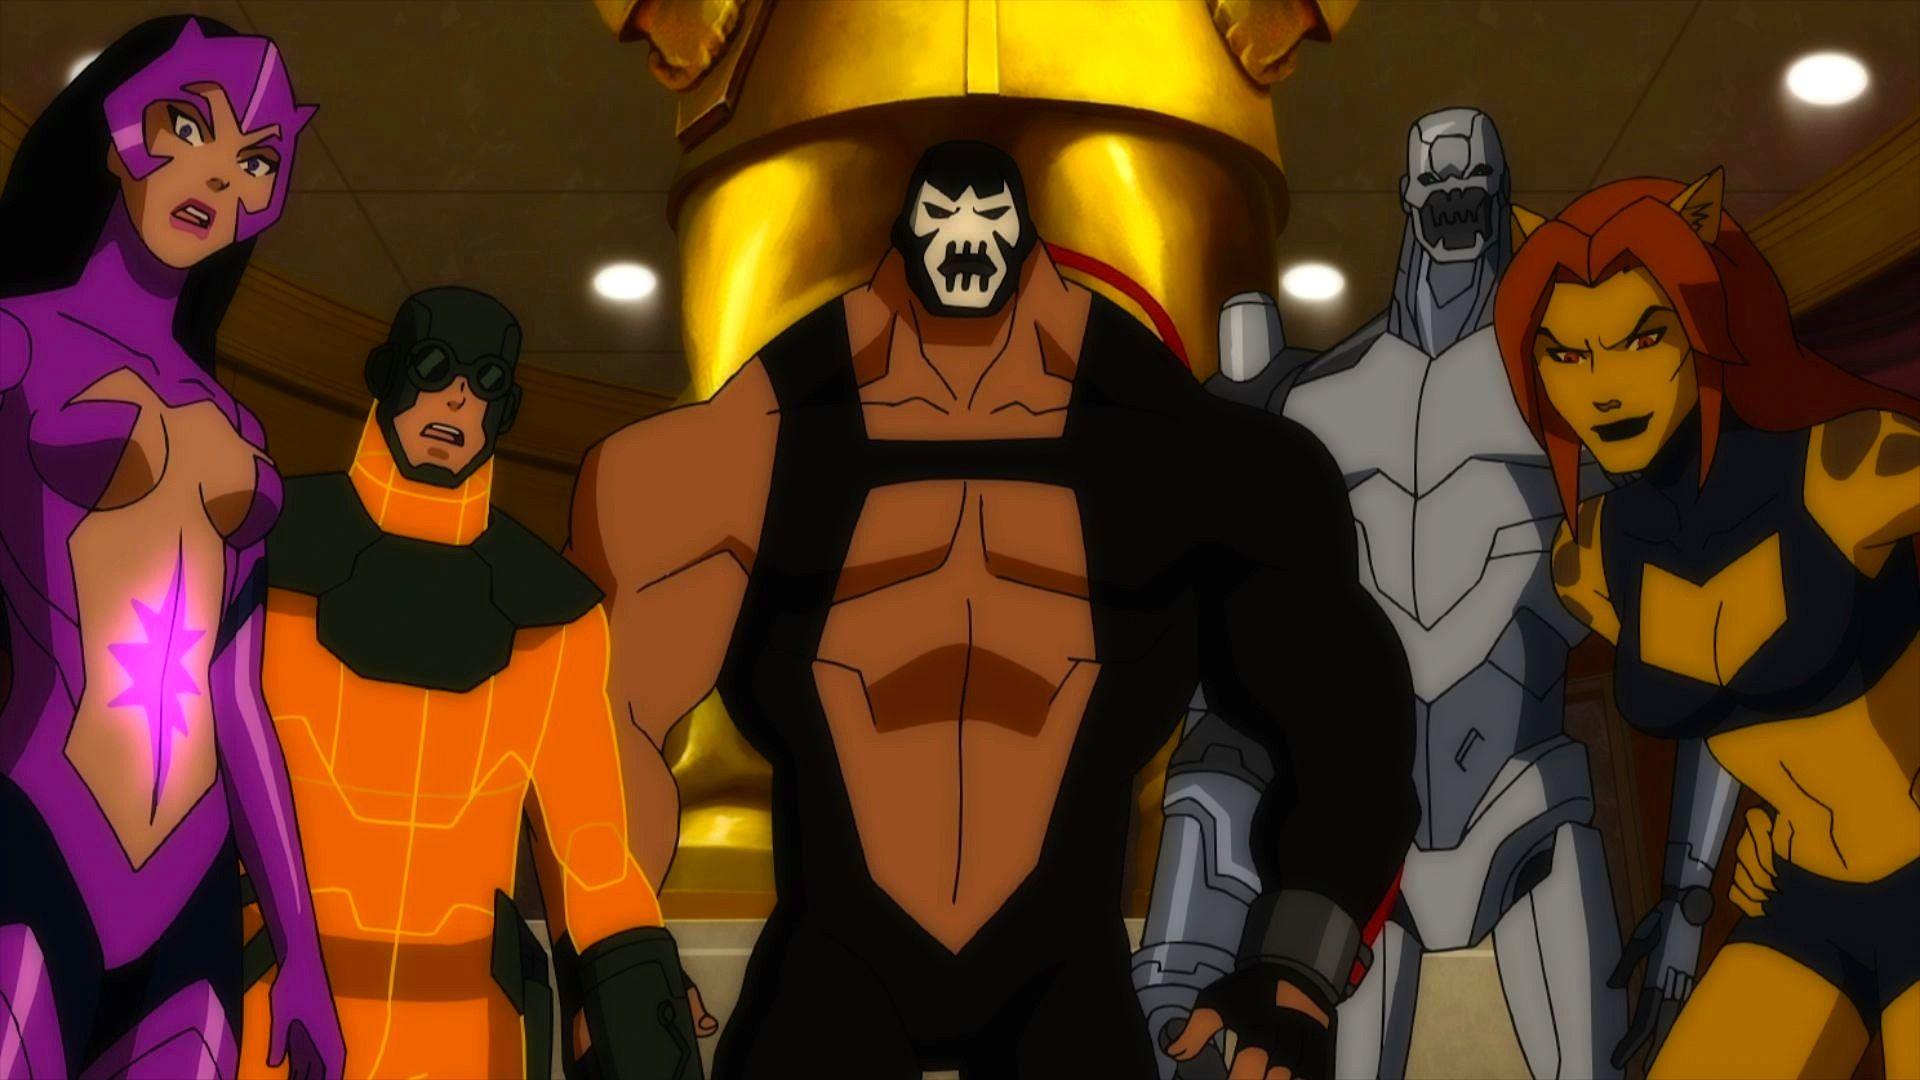 Justice league doom coloring pages | 1080x1920